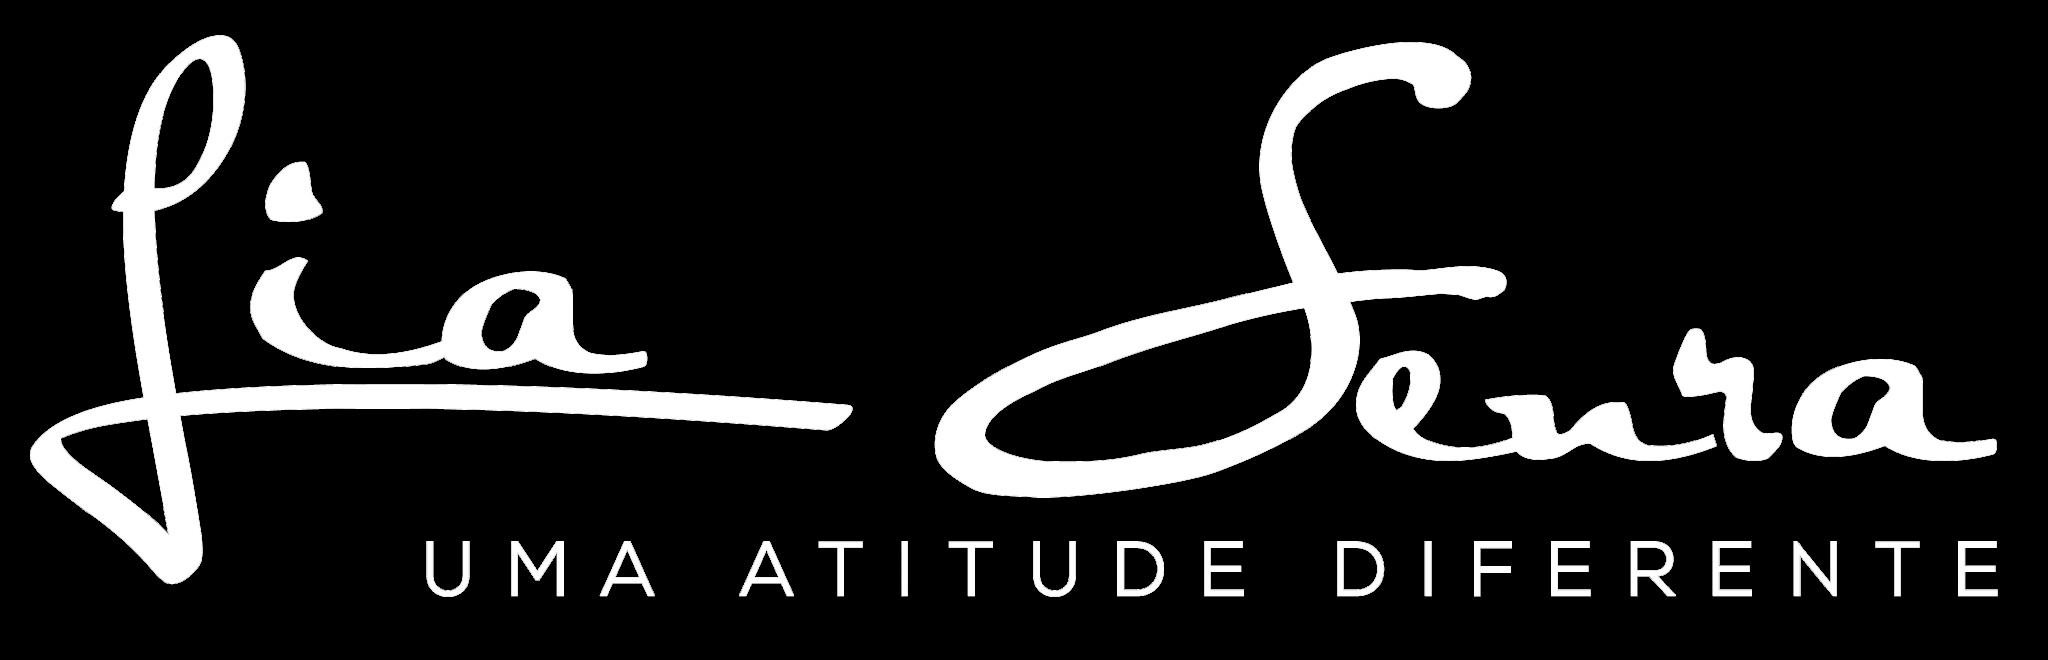 Logo_White_SEM FUNDO